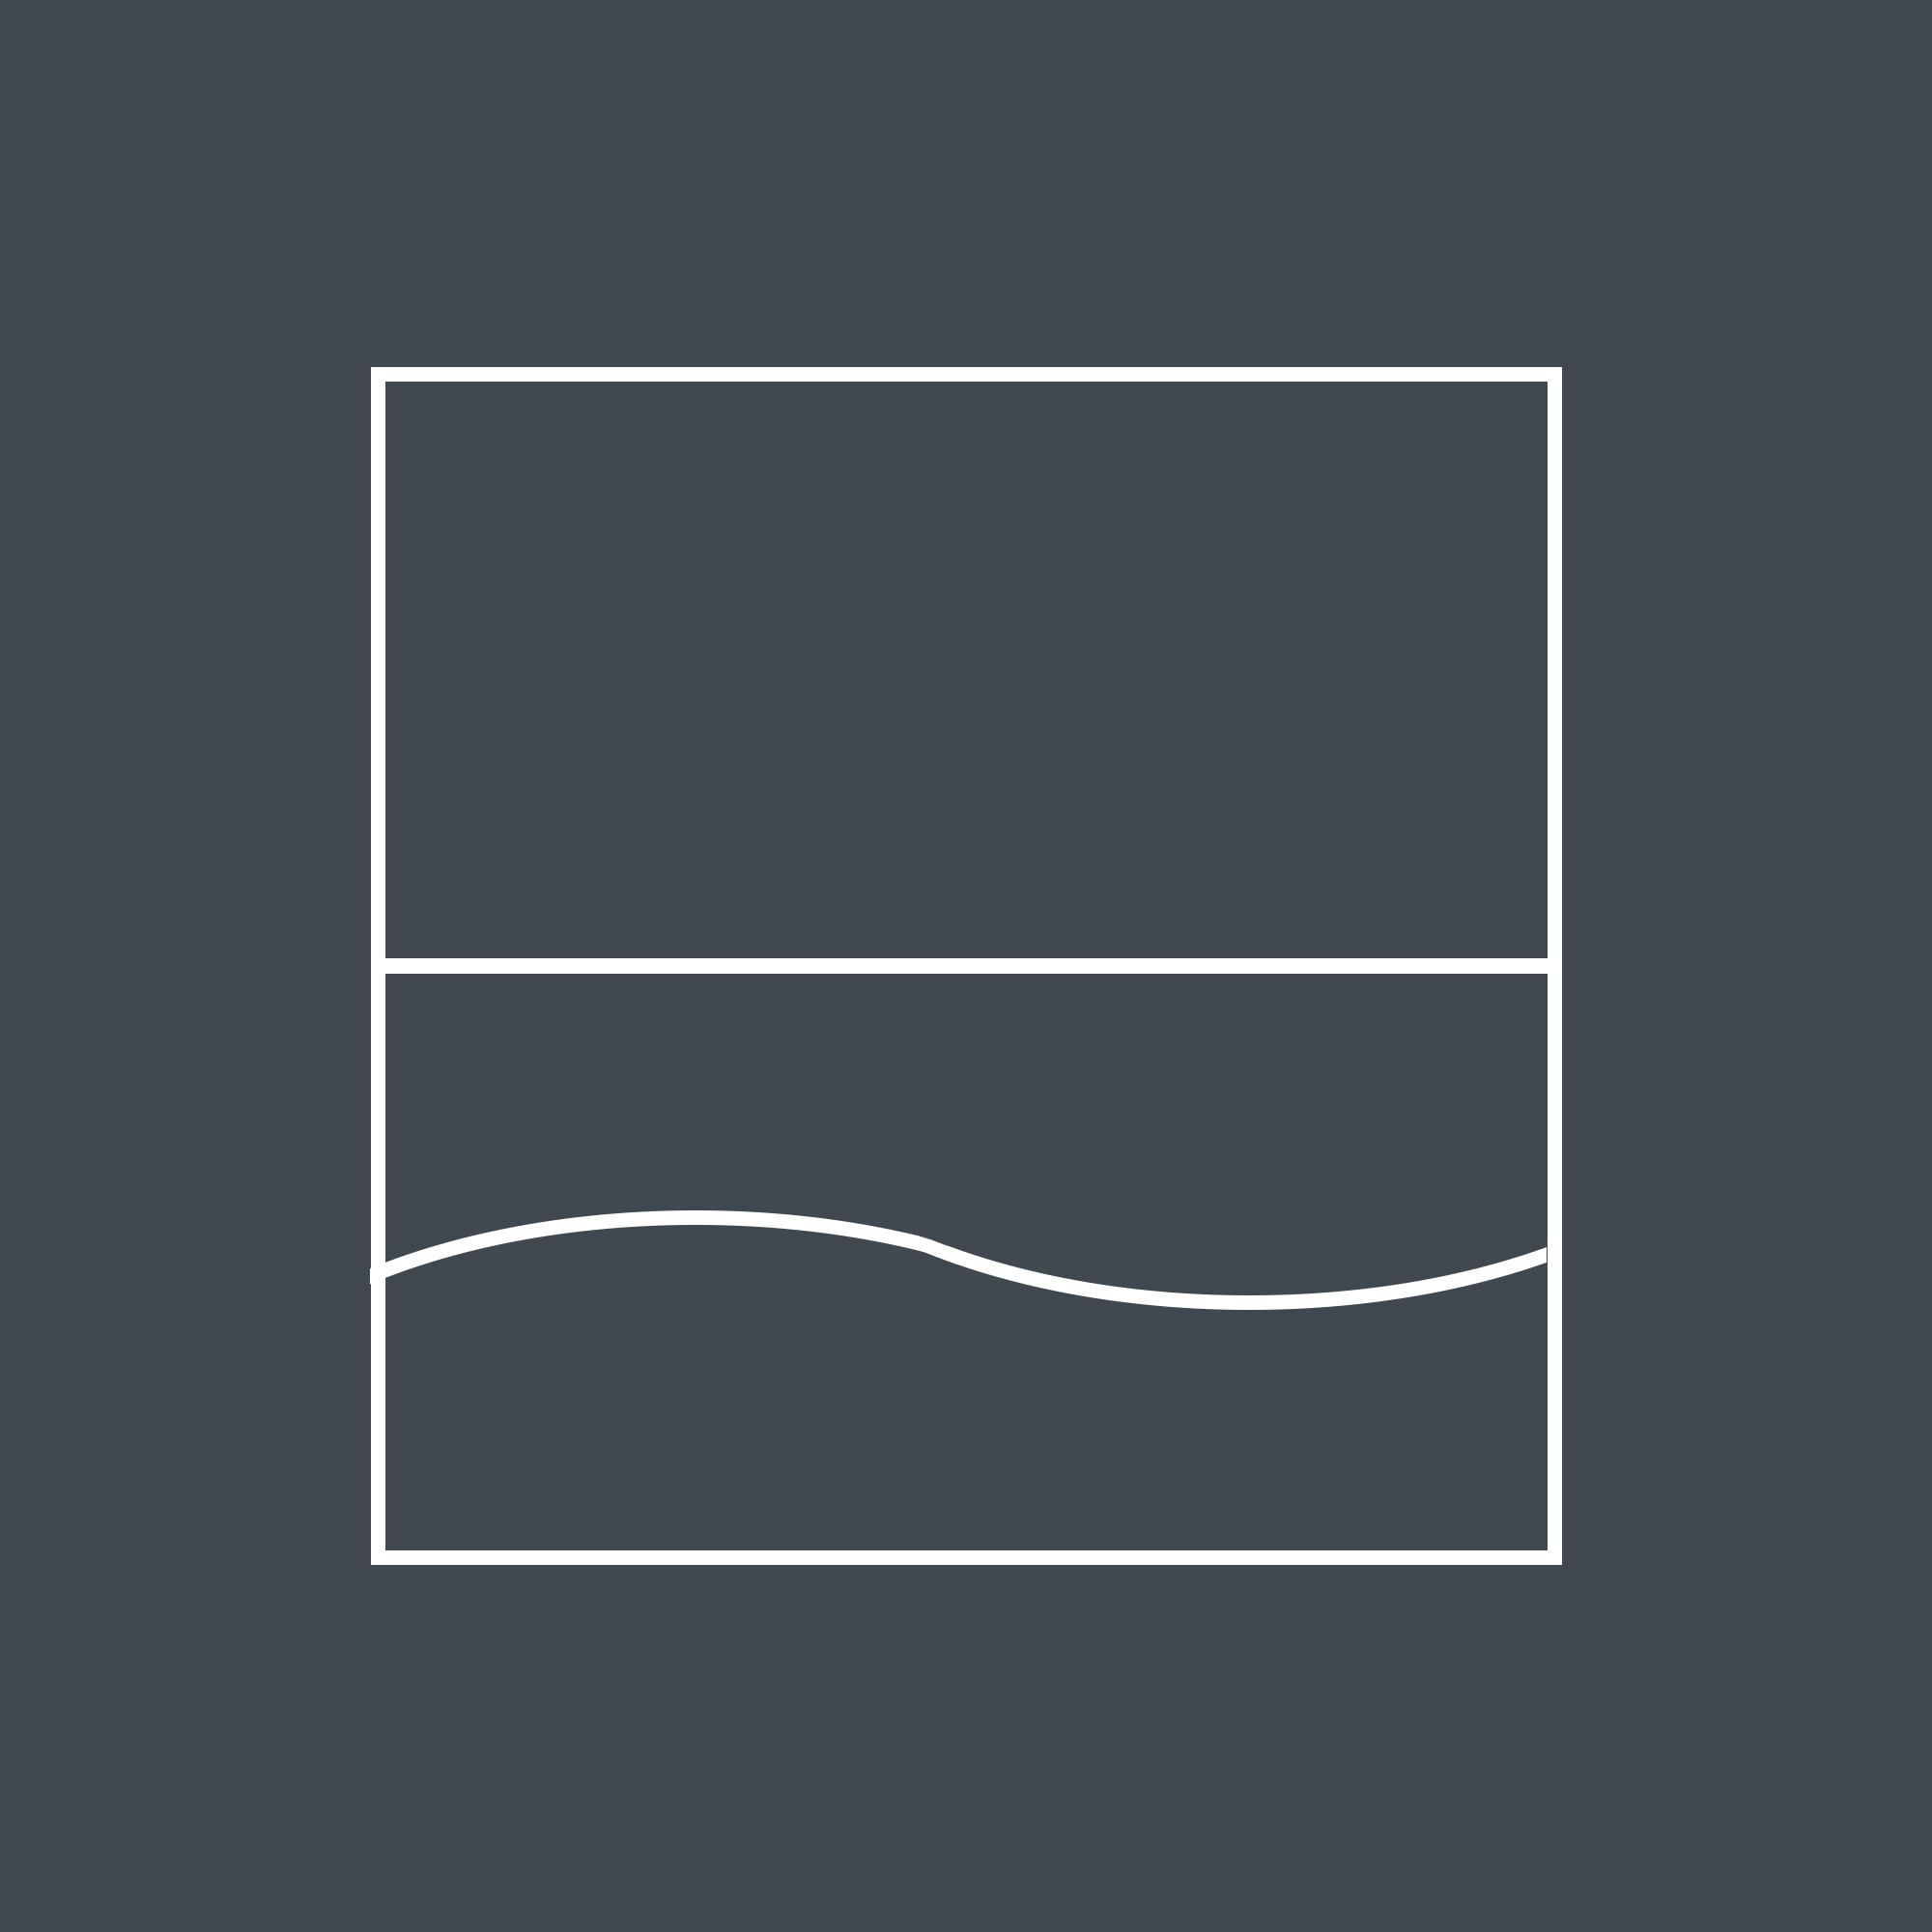 soho-house-mailbu-logo